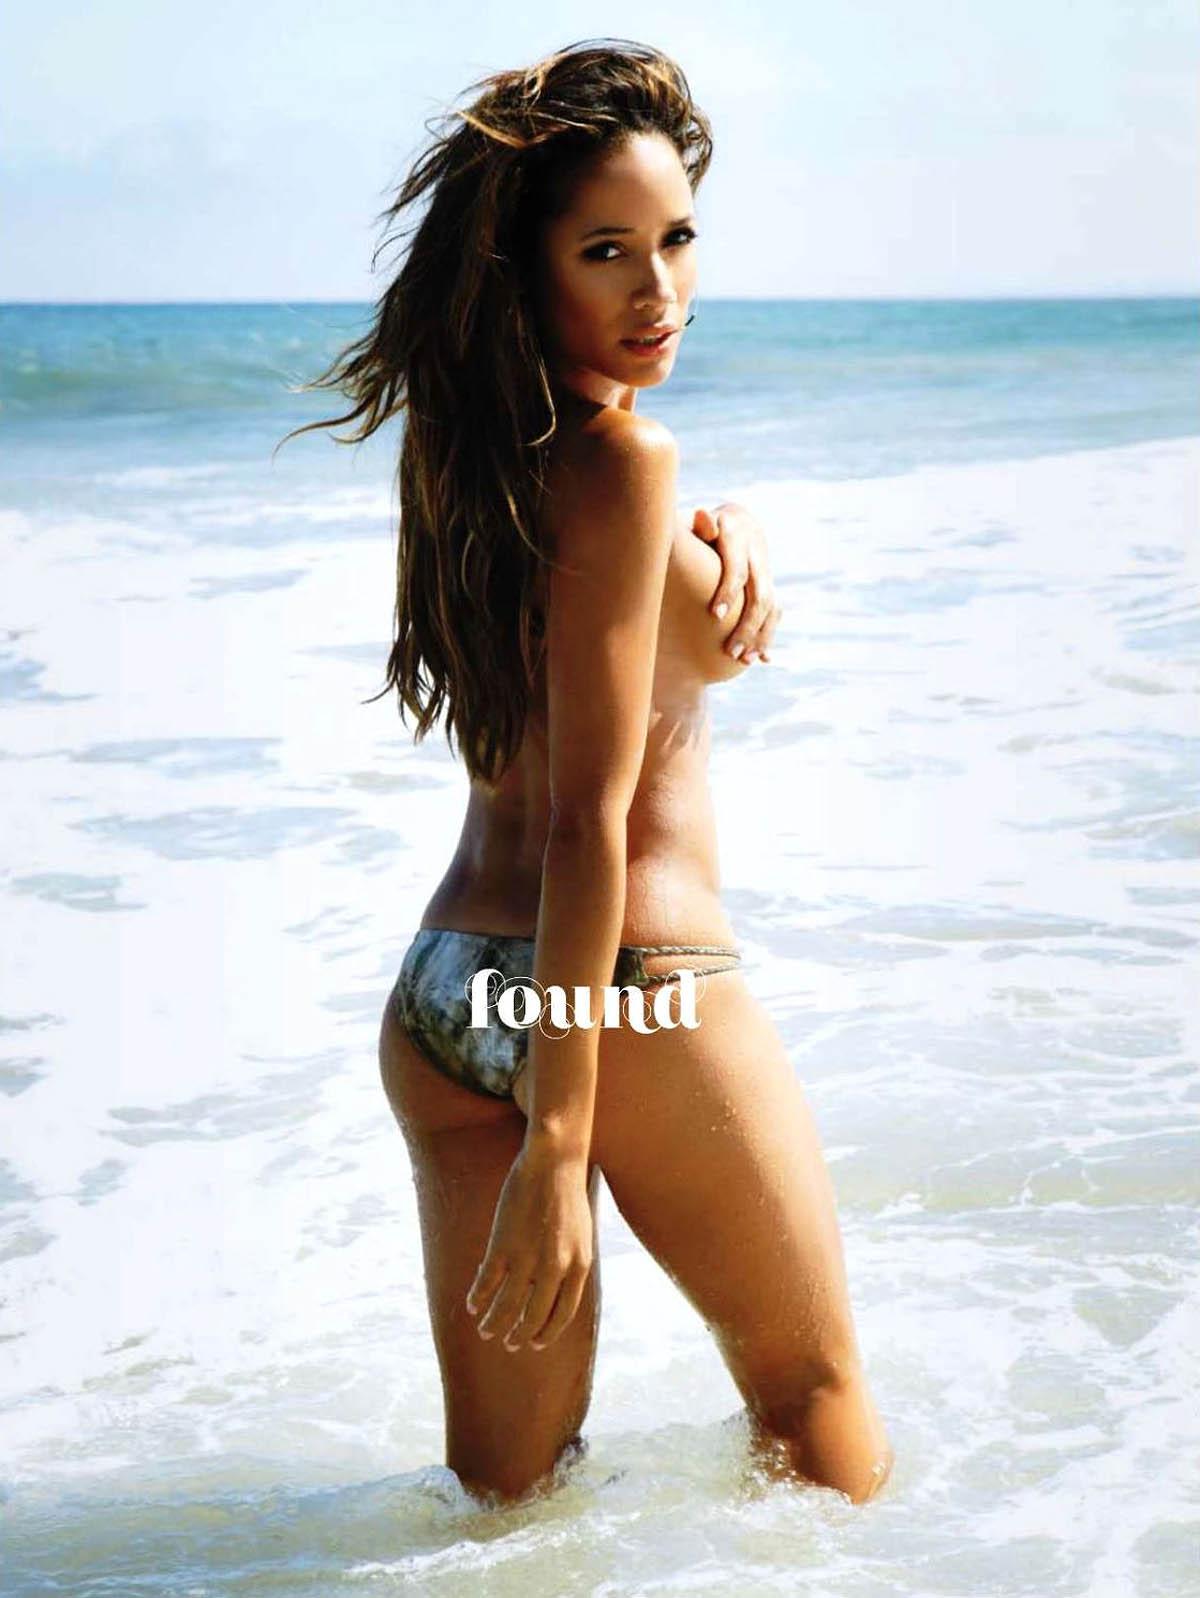 Something Dania ramirez bikini agree